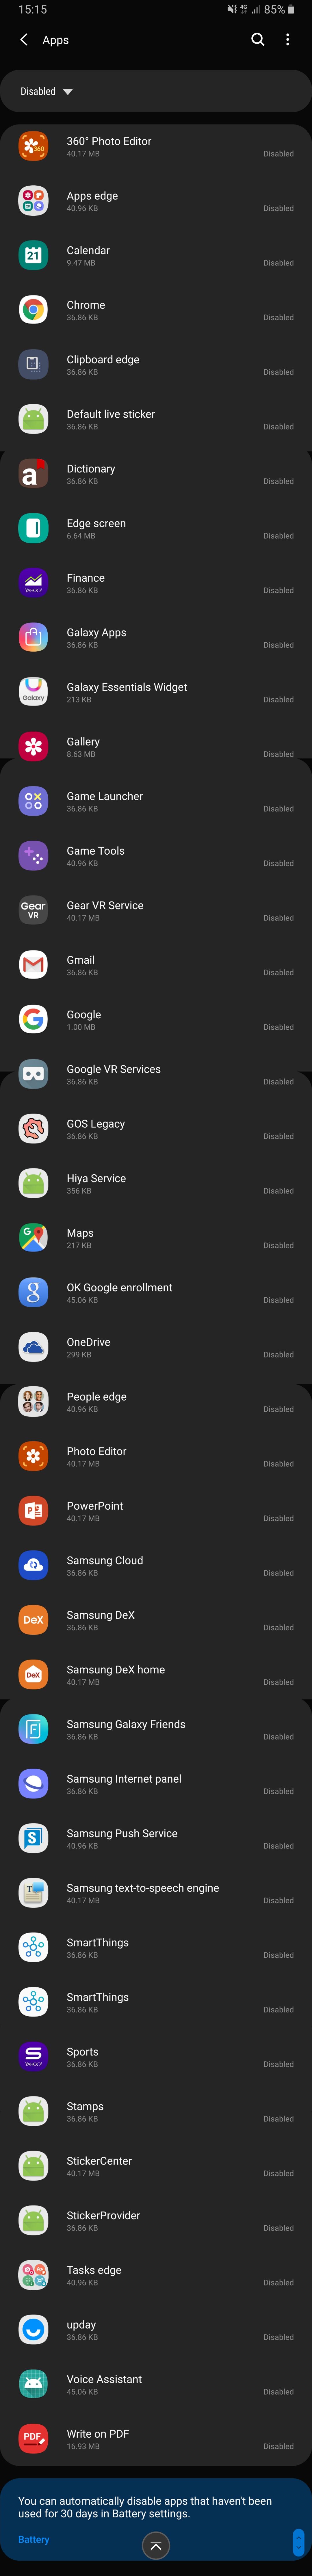 Security updates for Samsung S8 | EskeRahn